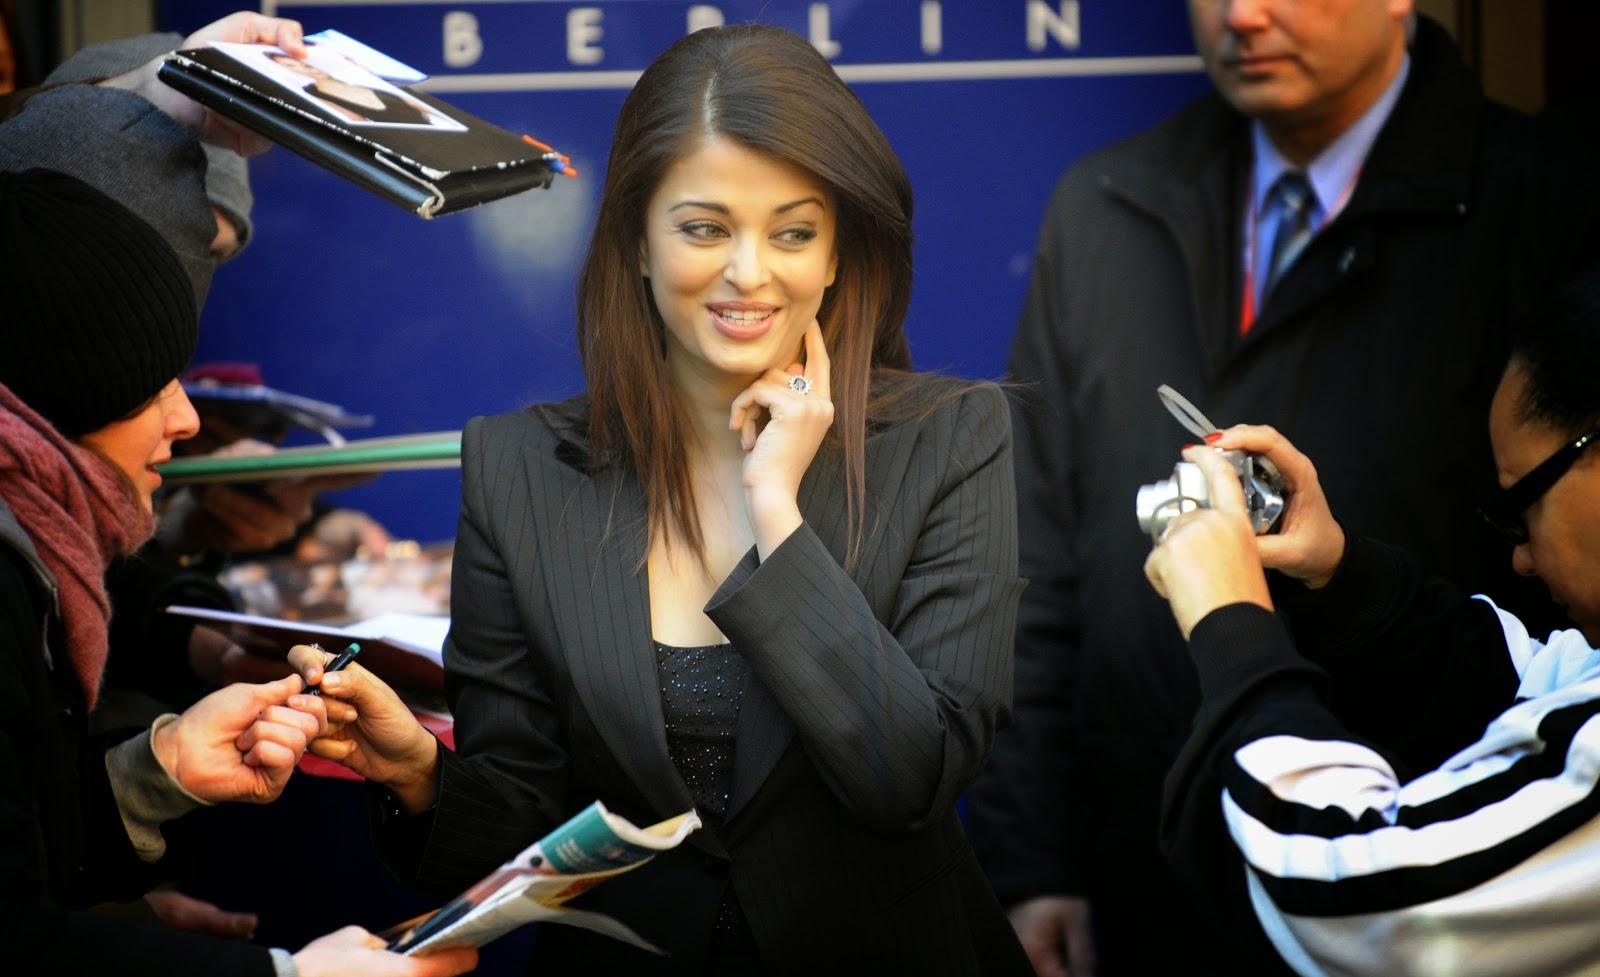 Aishwarya Rai Bachchan in Black Dress HD Photos- 59th Berlin Film Festival - 'Pink Panther 2' Photocall